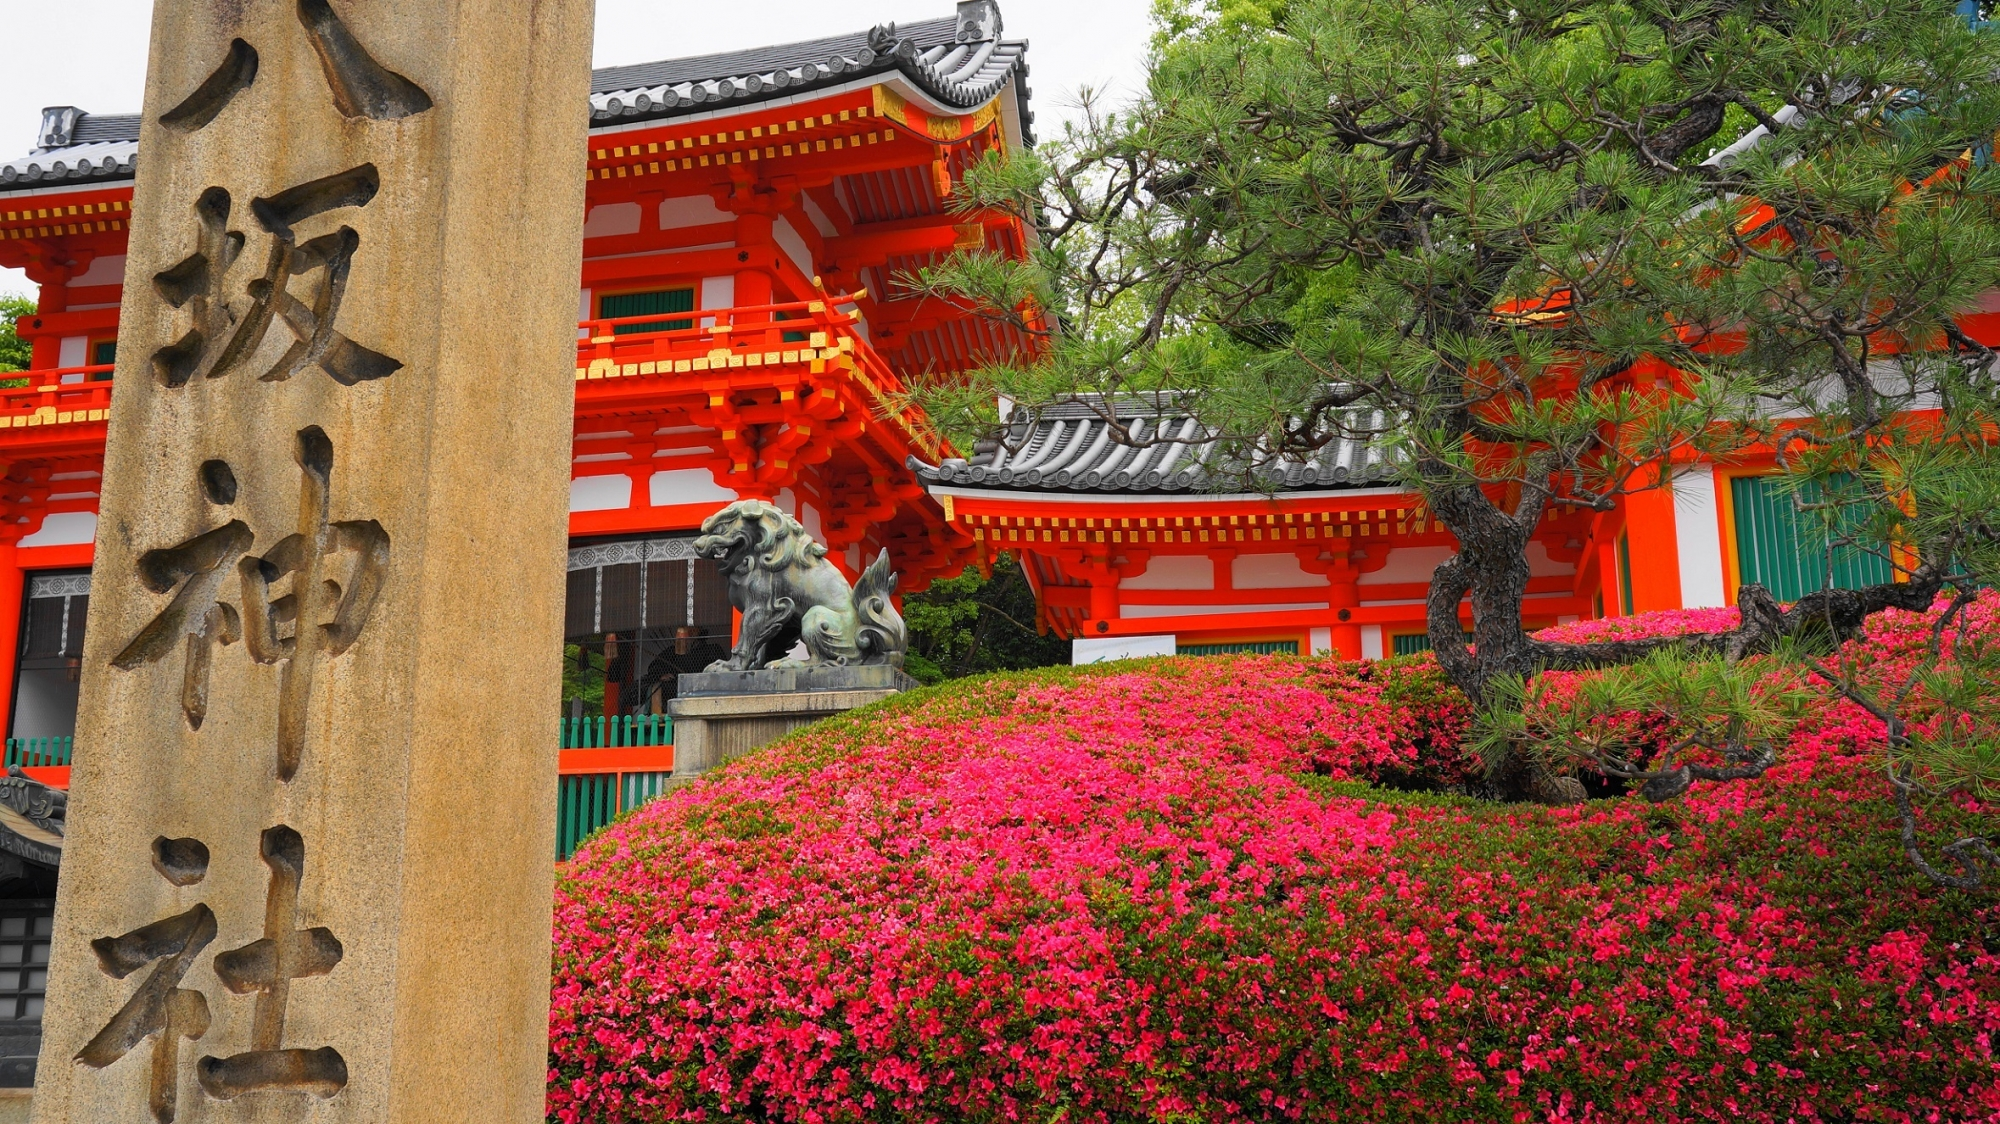 Yasaka-jinja Shrine Kyoto Azalea 満開 サツキ 華やか 八坂神社 西楼門